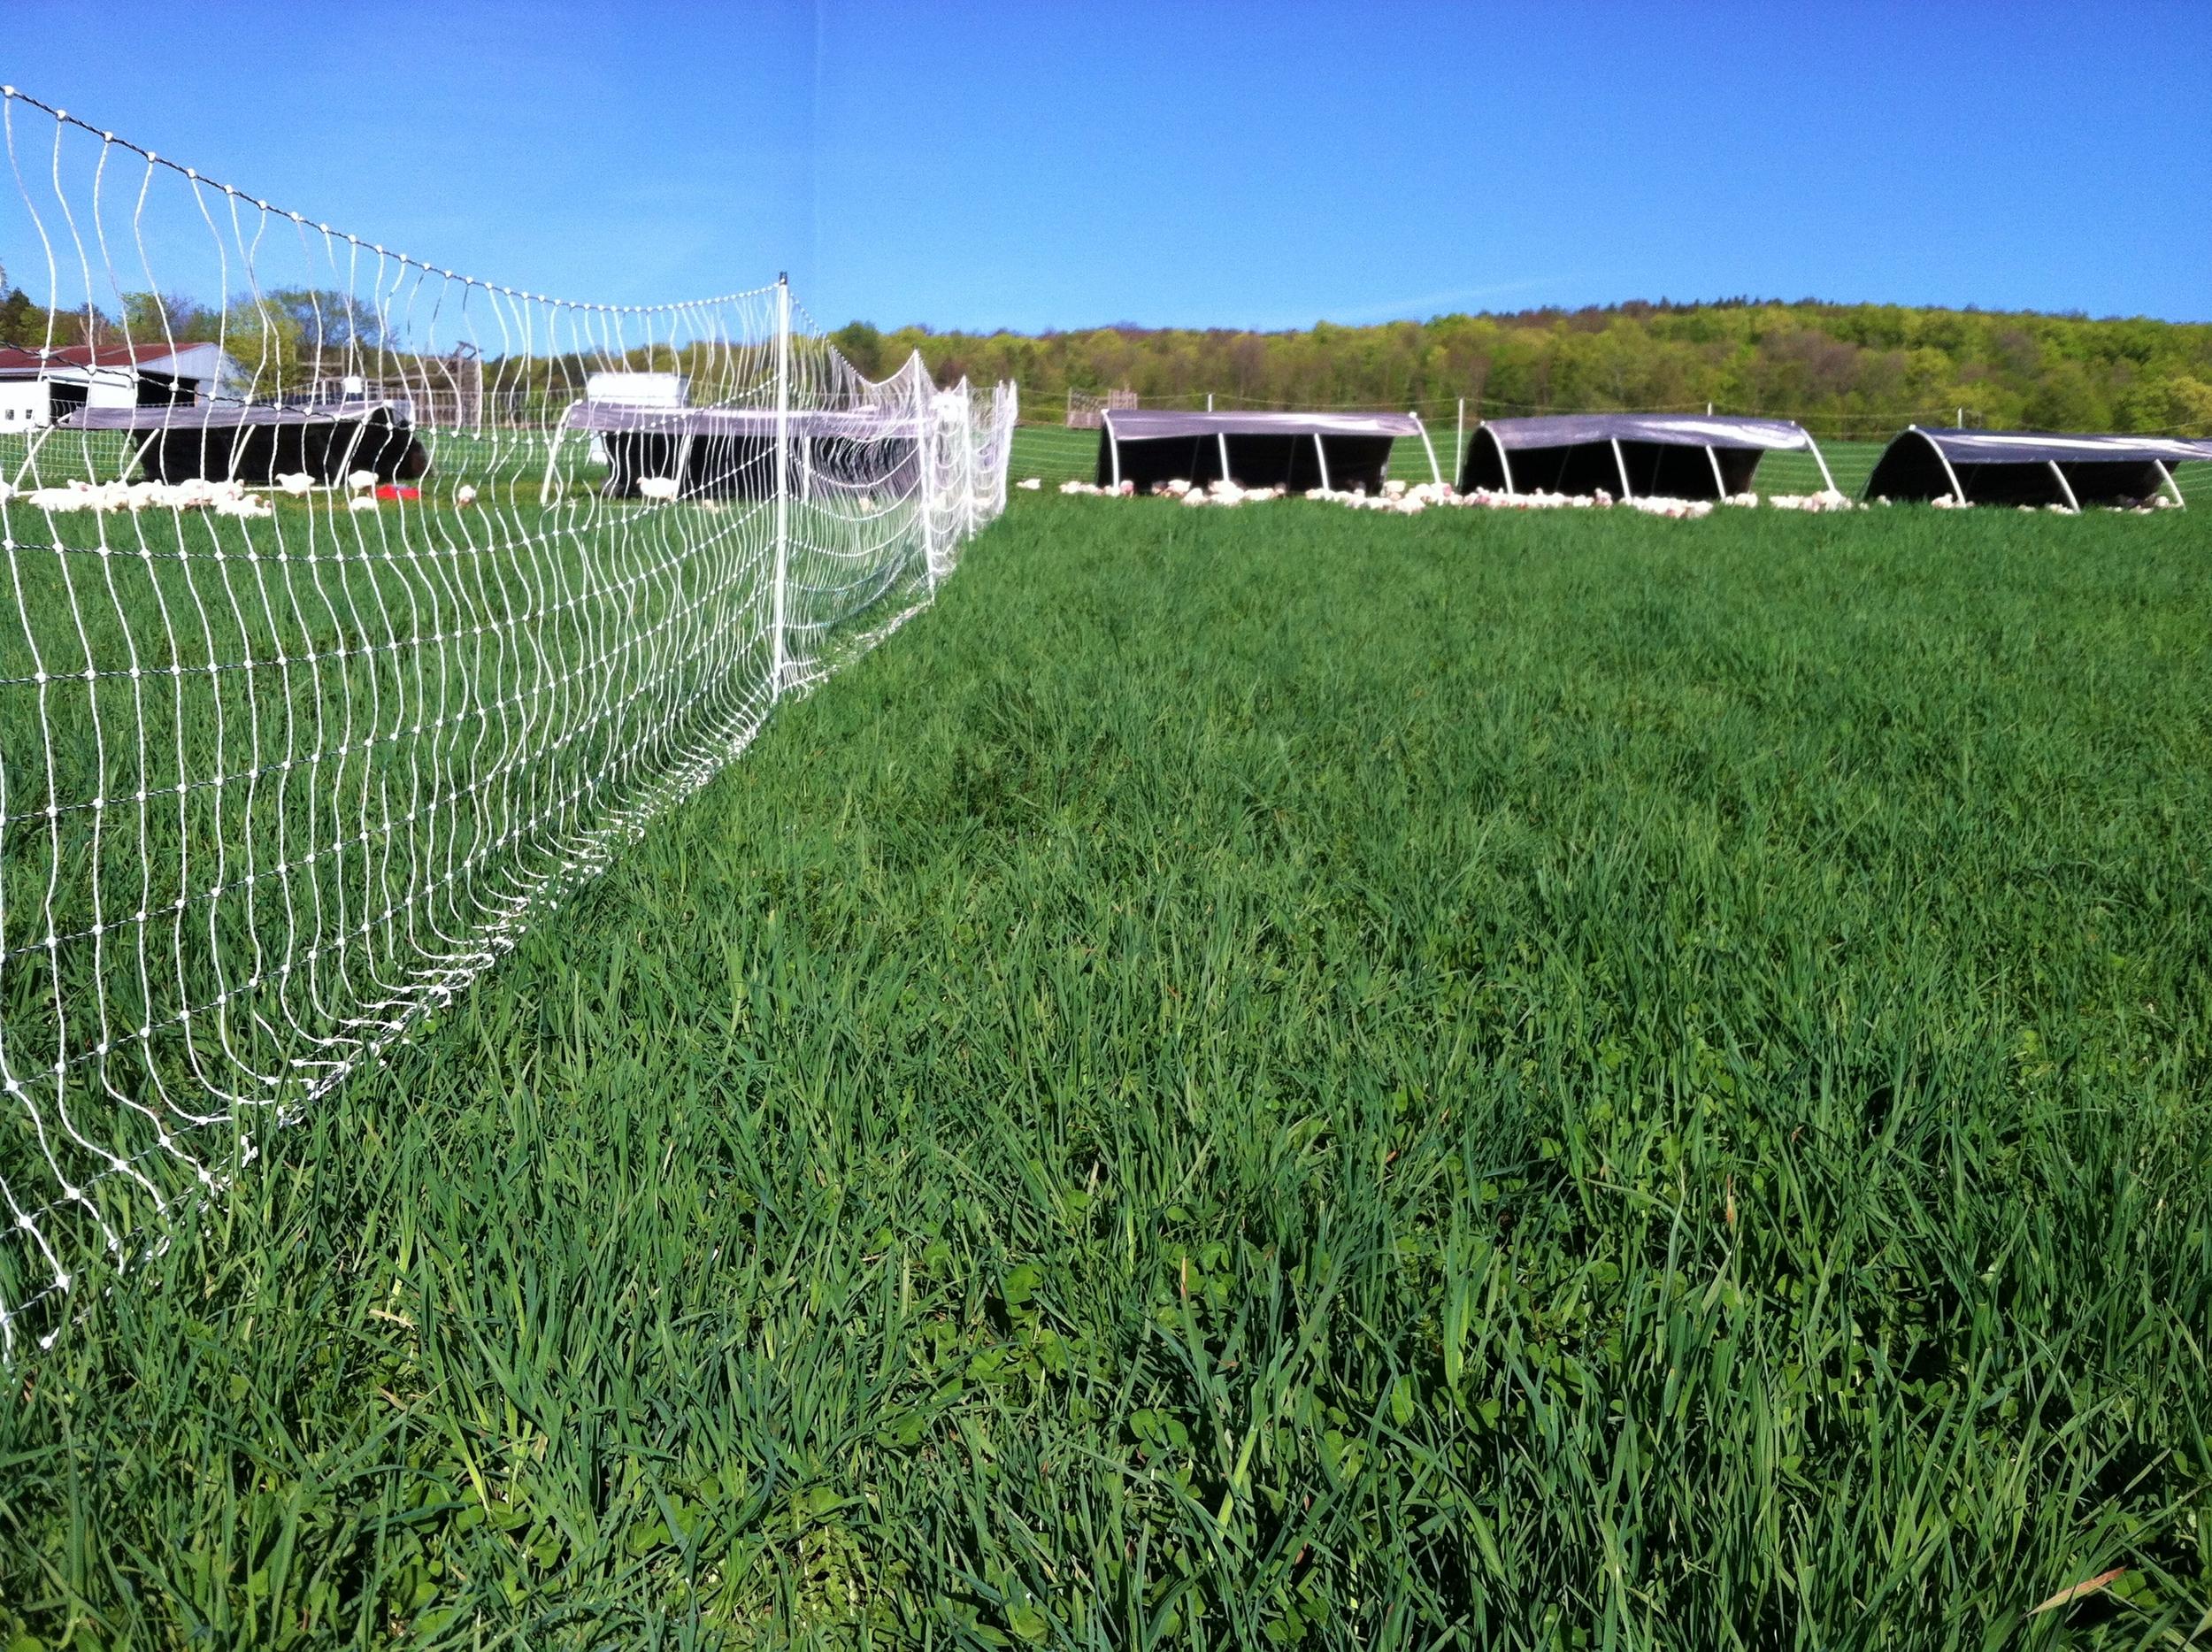 JFF chickens on pasture